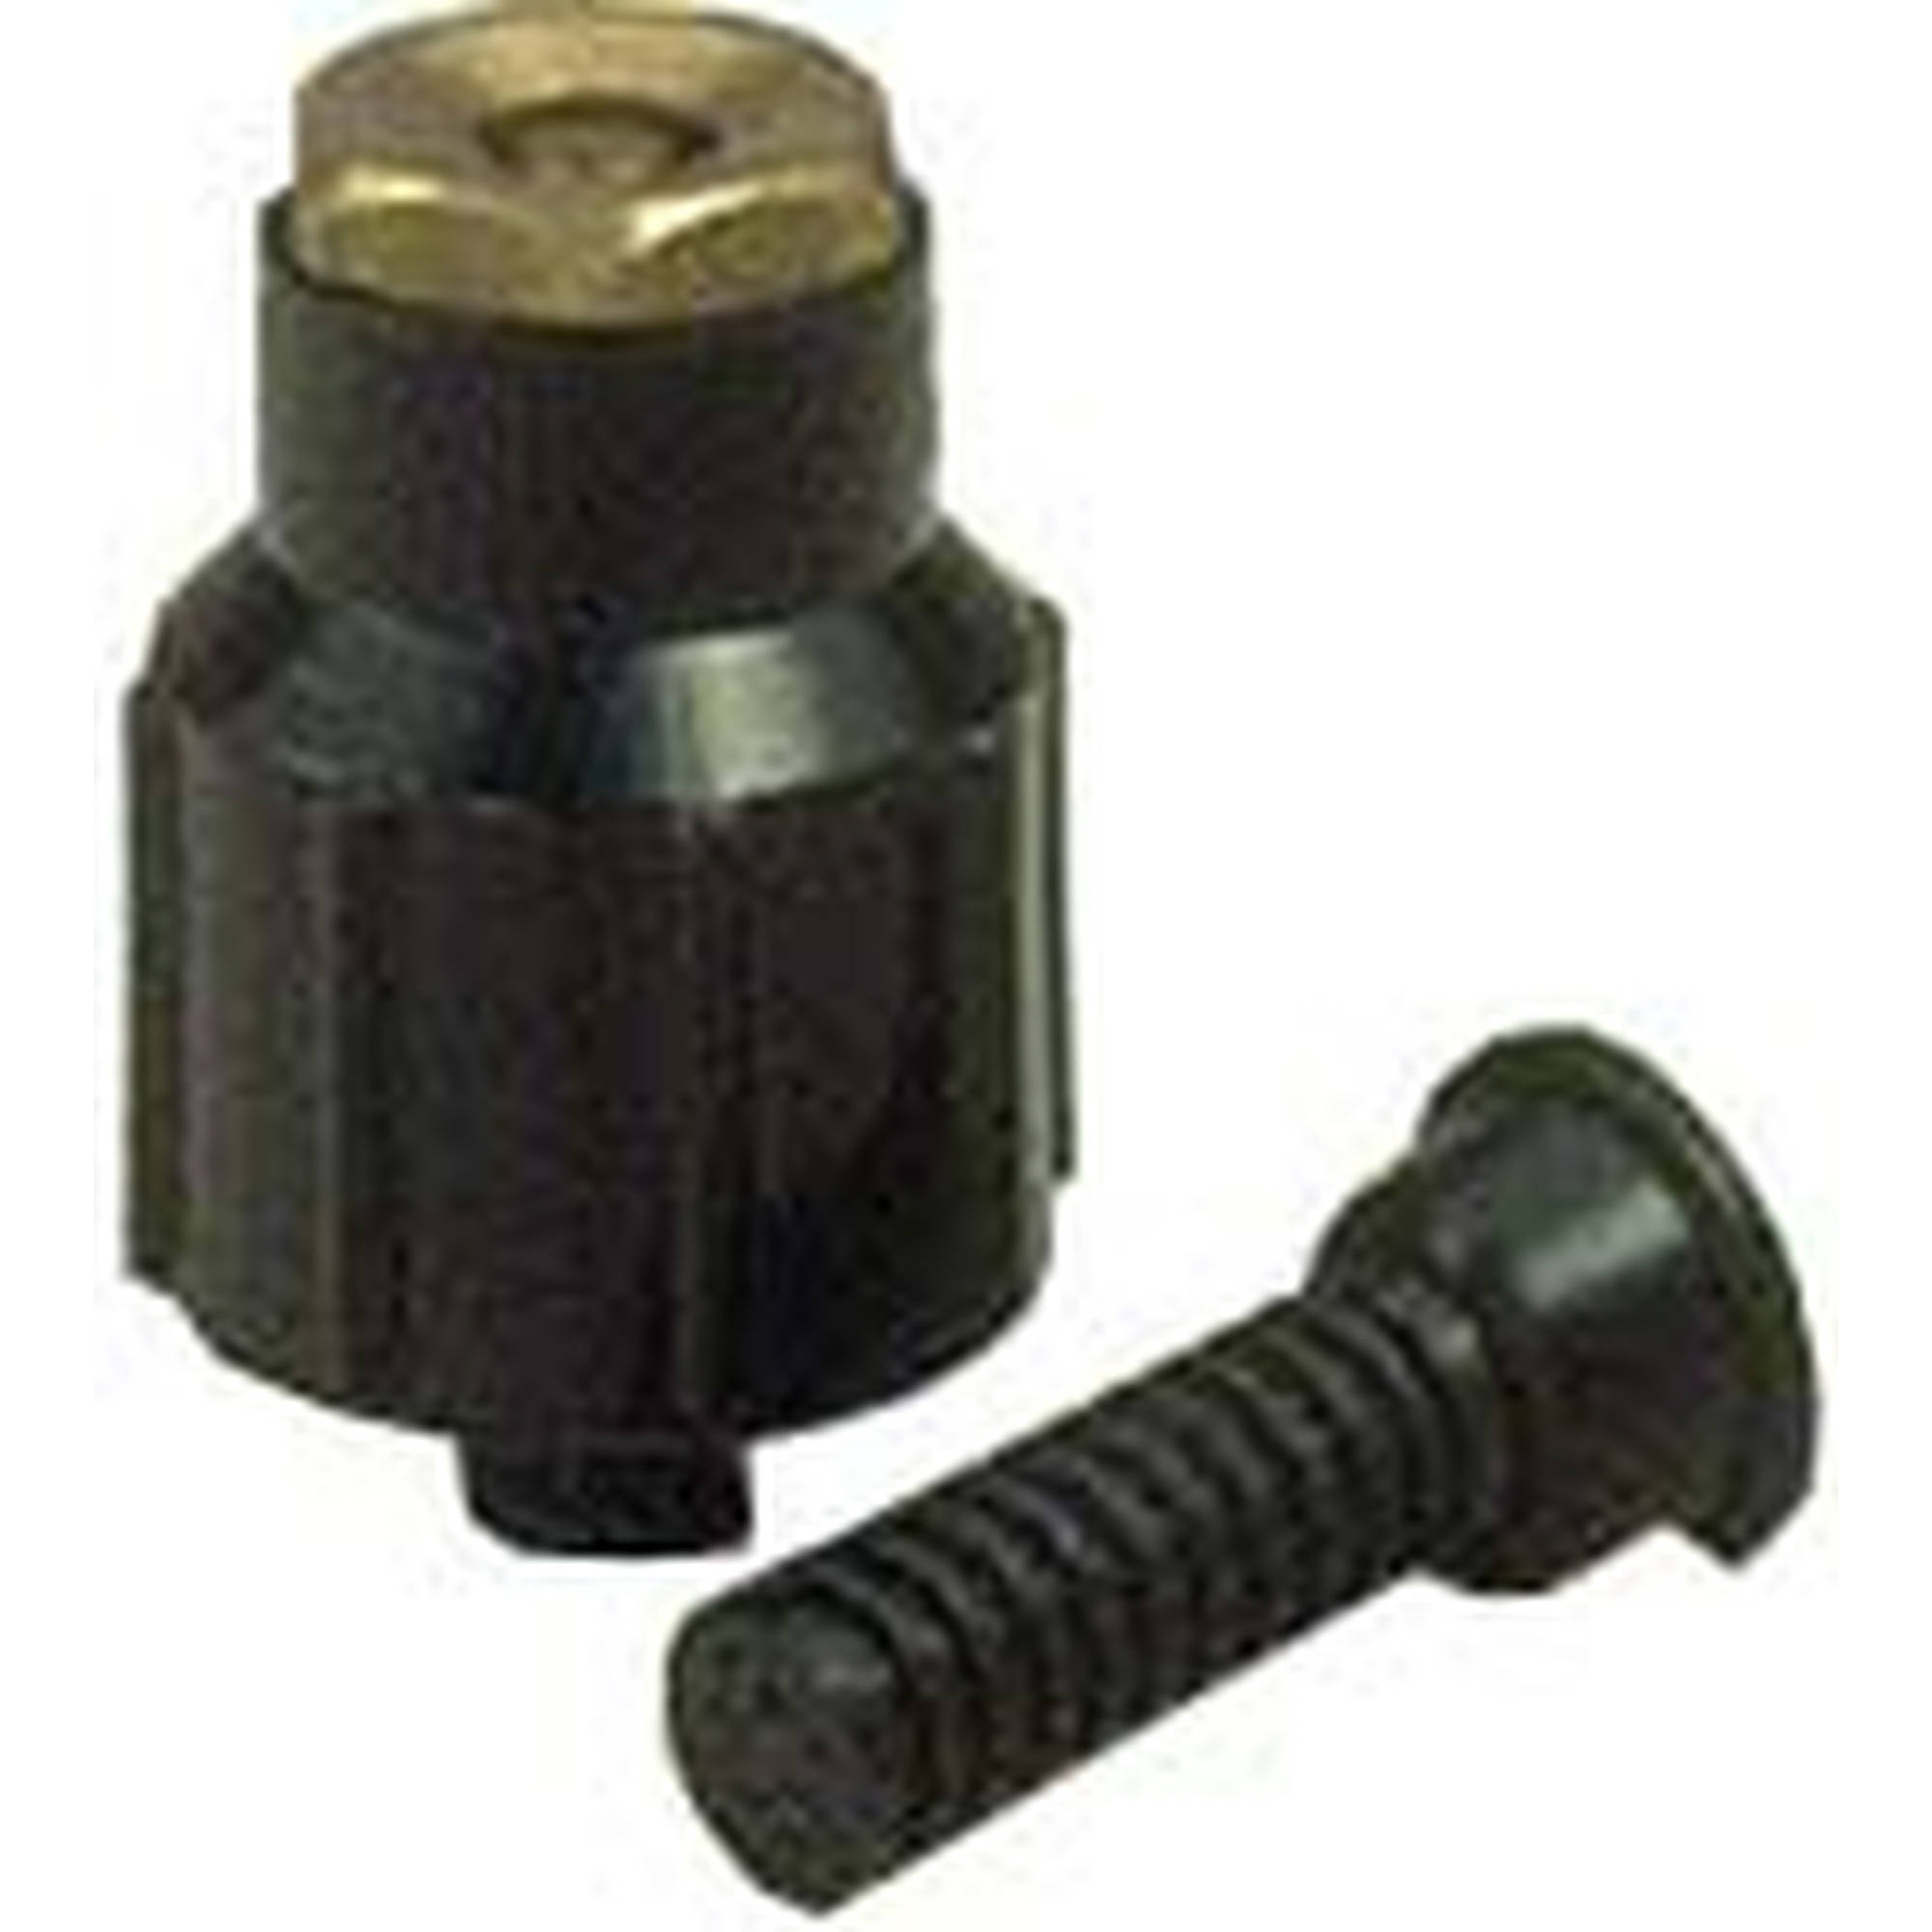 Orbit 54039D Half Circle Plastic Shrub with Brass Nozzle